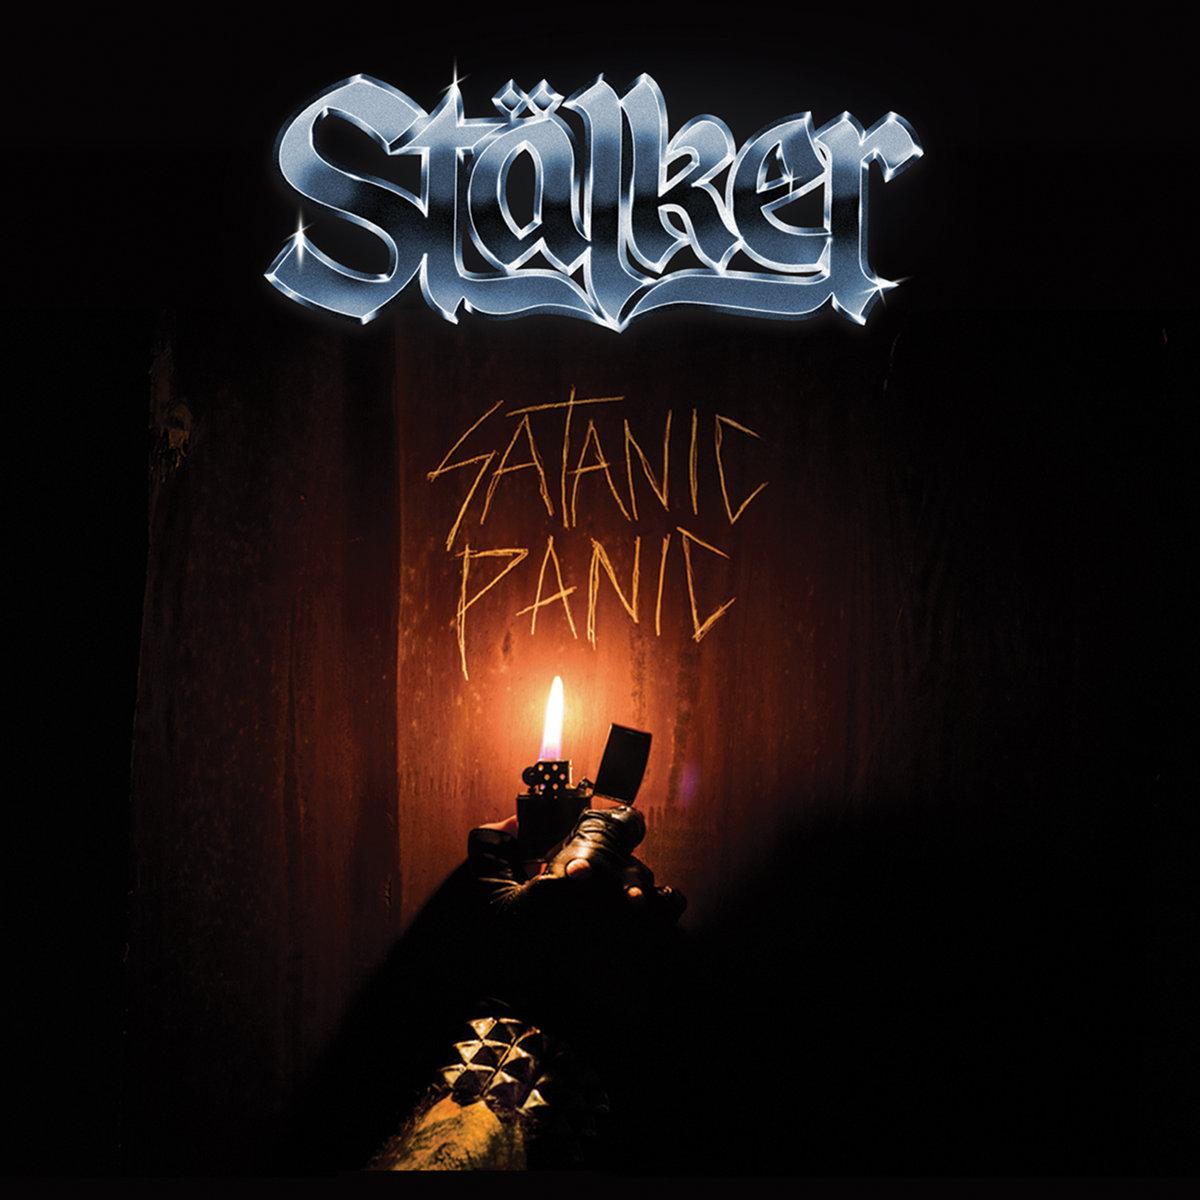 Stalker - Satanic Panic